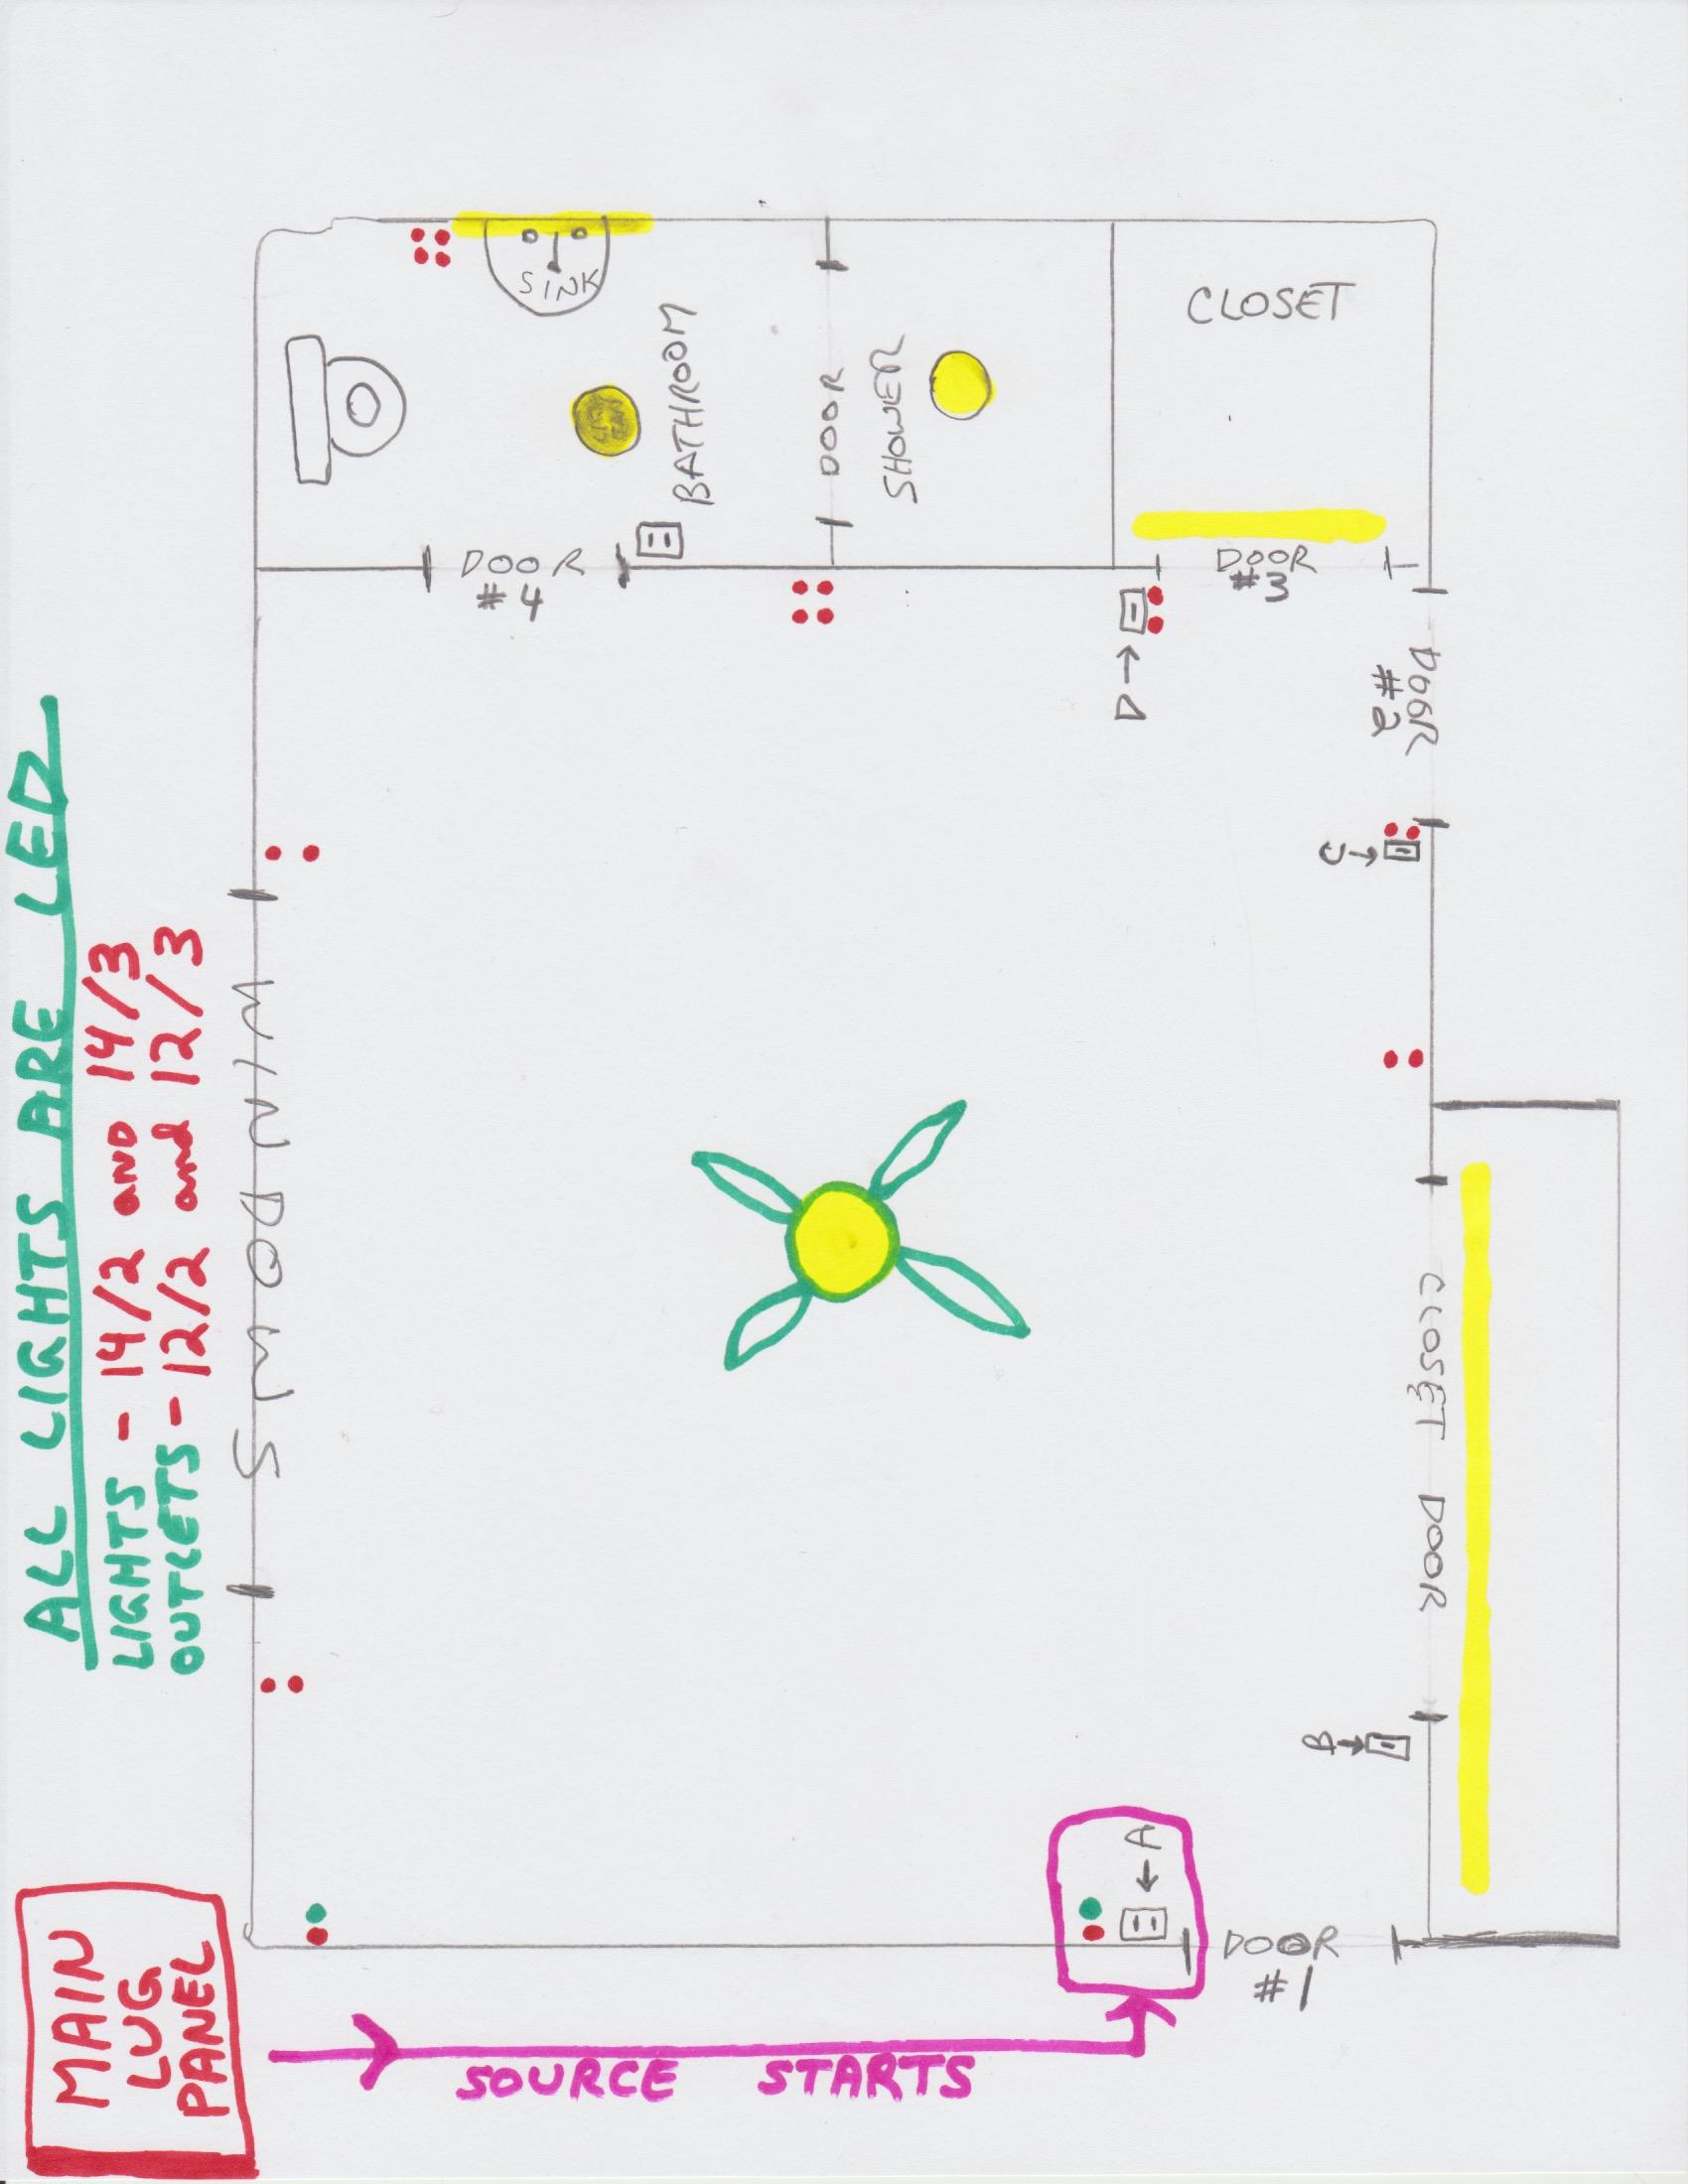 bathroom fan wiring diagram 2006 chevy colorado electrical need to help rewiring a bedroom and enter image description here